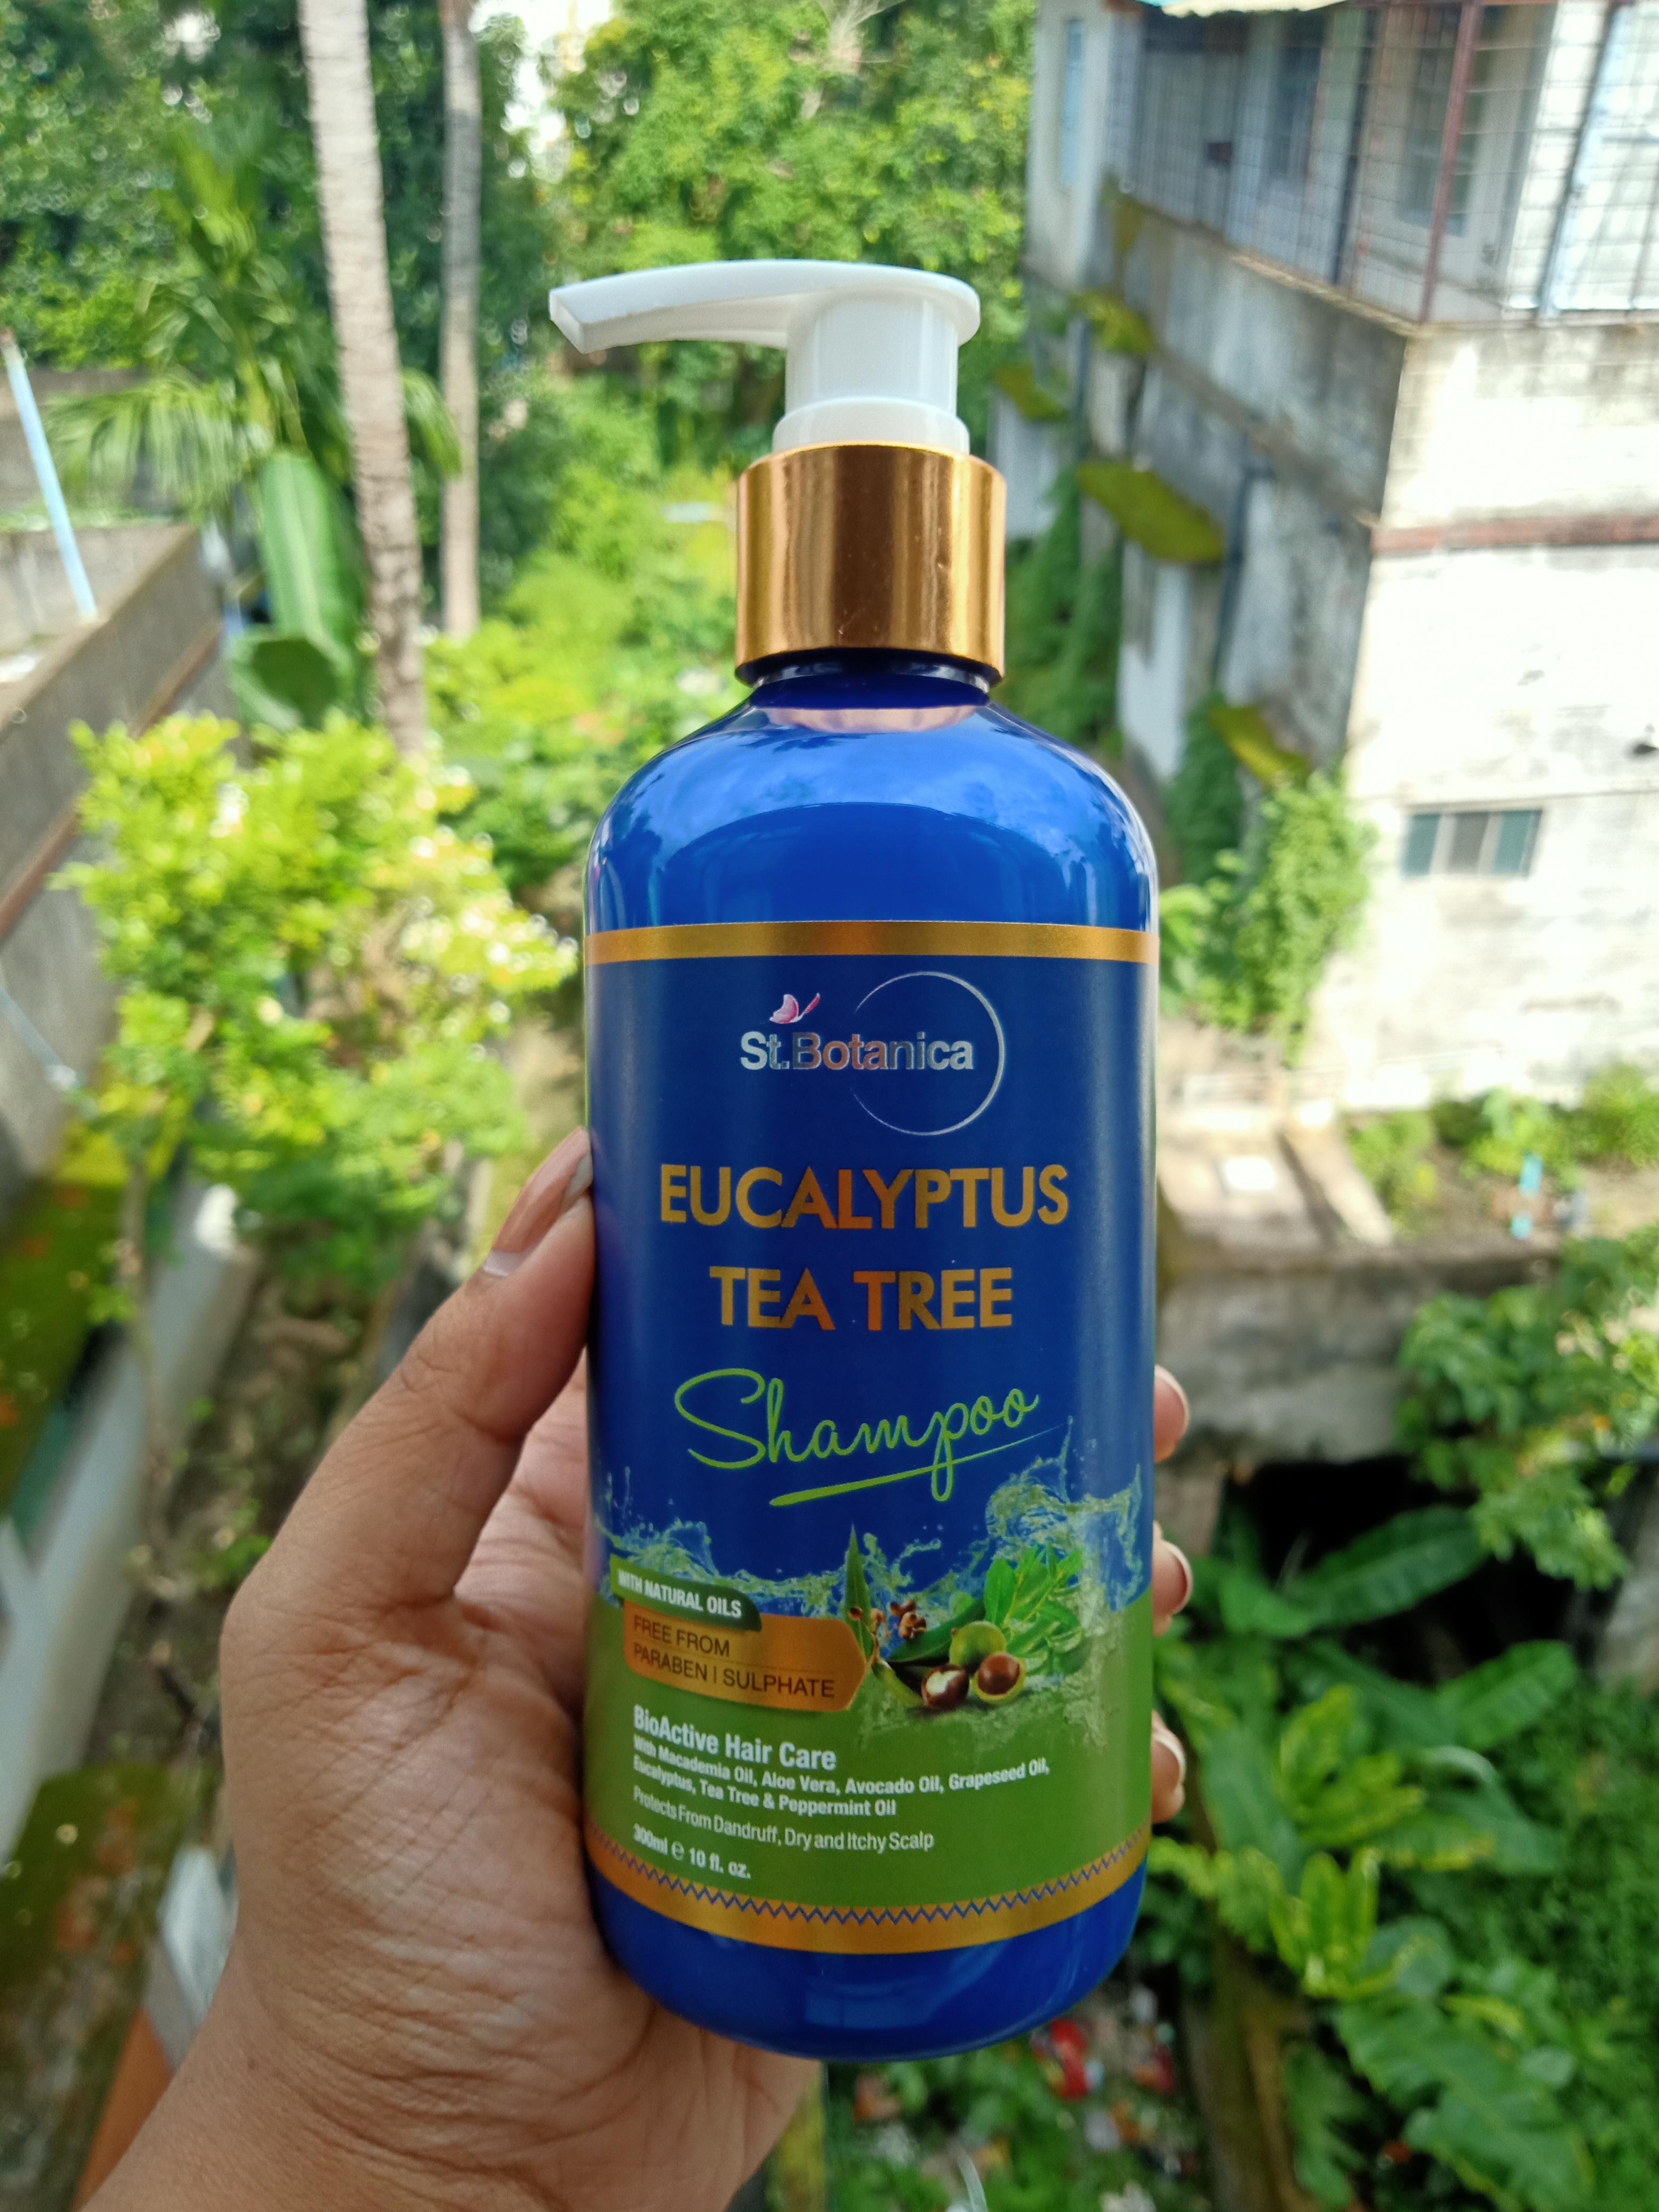 St.Botanica Eucalyptus & Tea Tree Dry Hair Repair Shampoo pic 1-Smooth No Drandruff Hair.-By rweehma